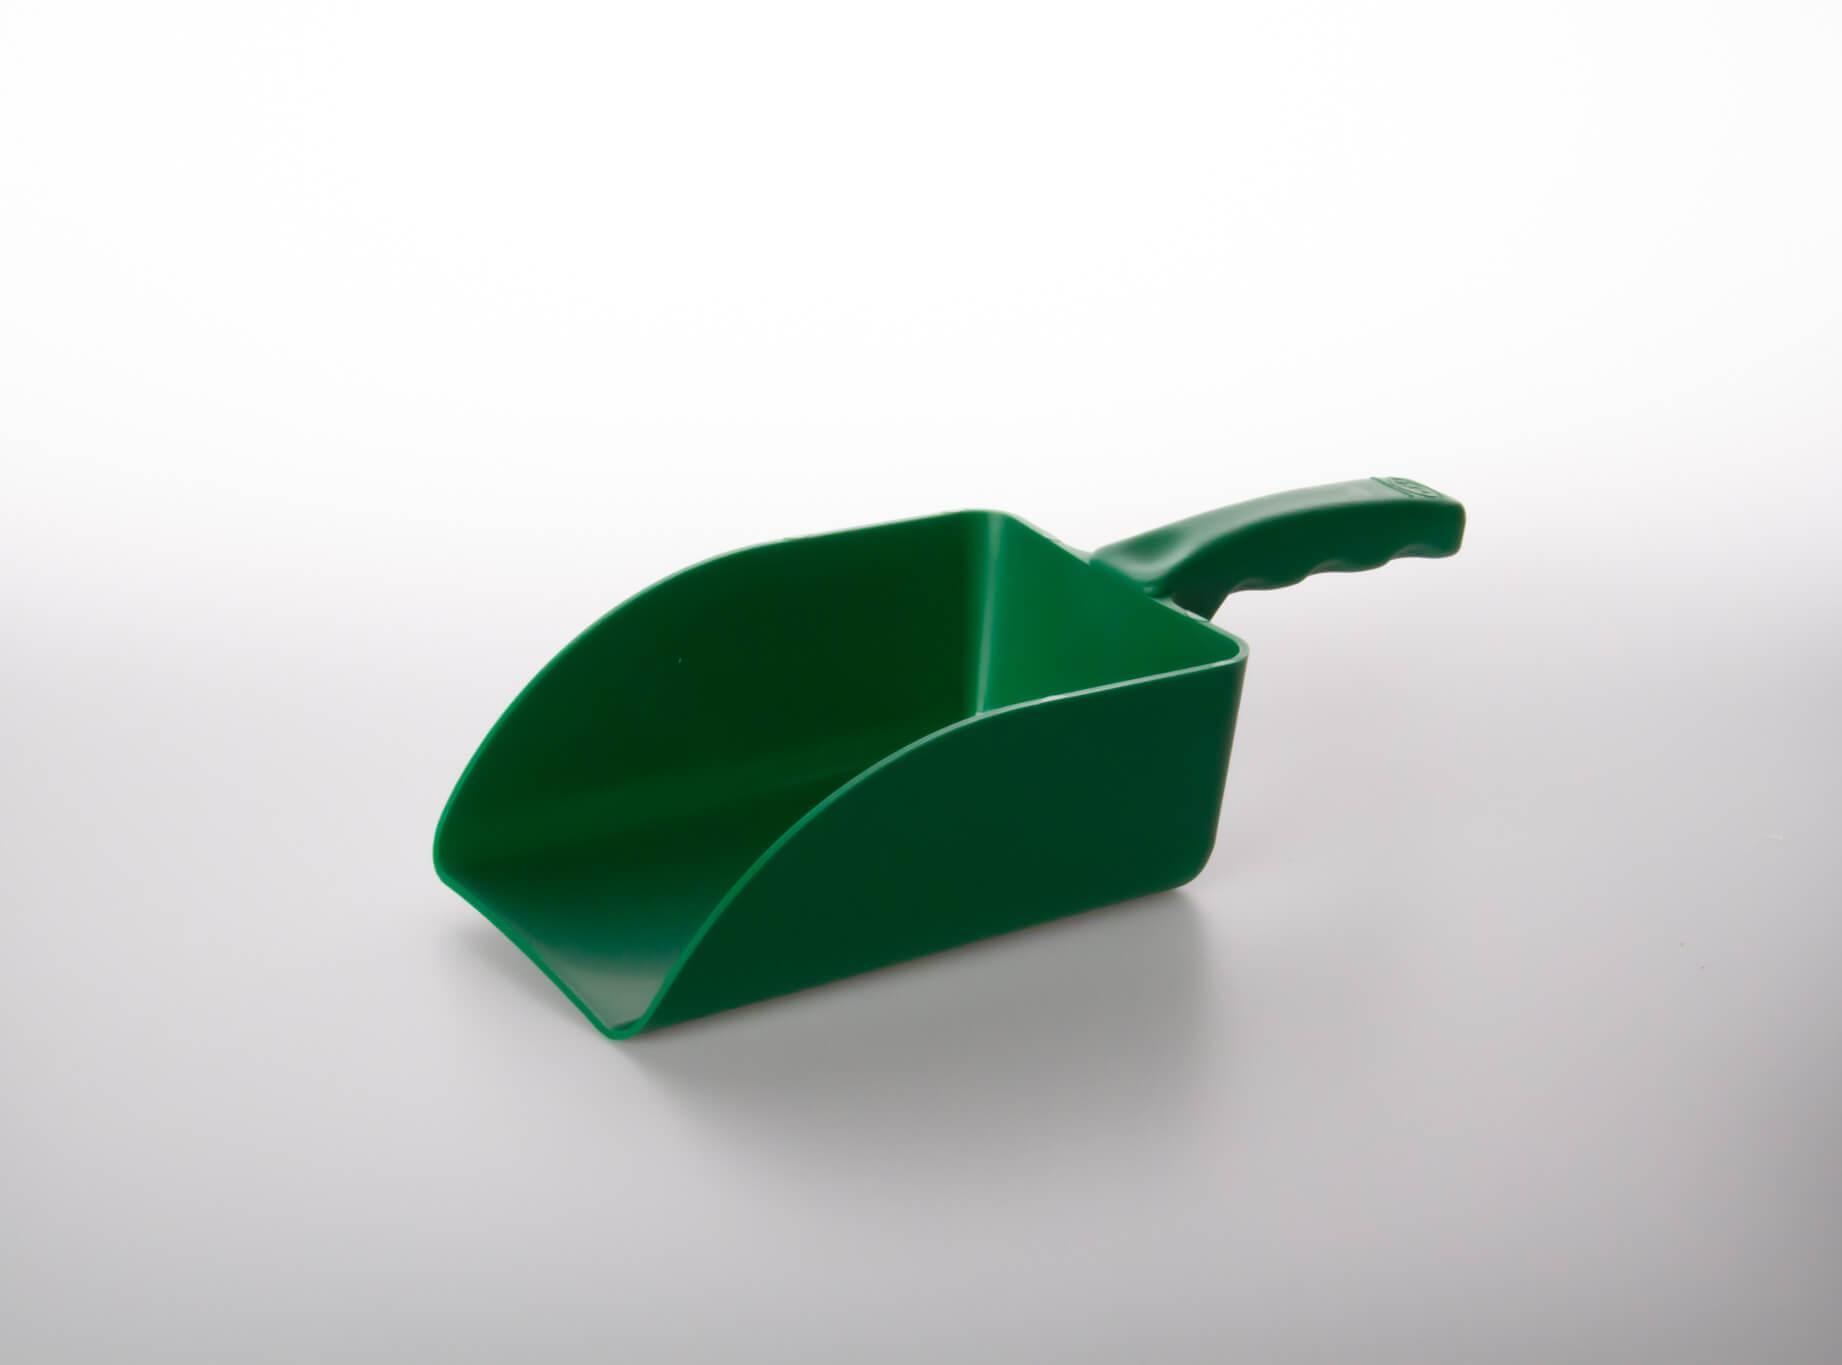 Creeds Plastic Scoops